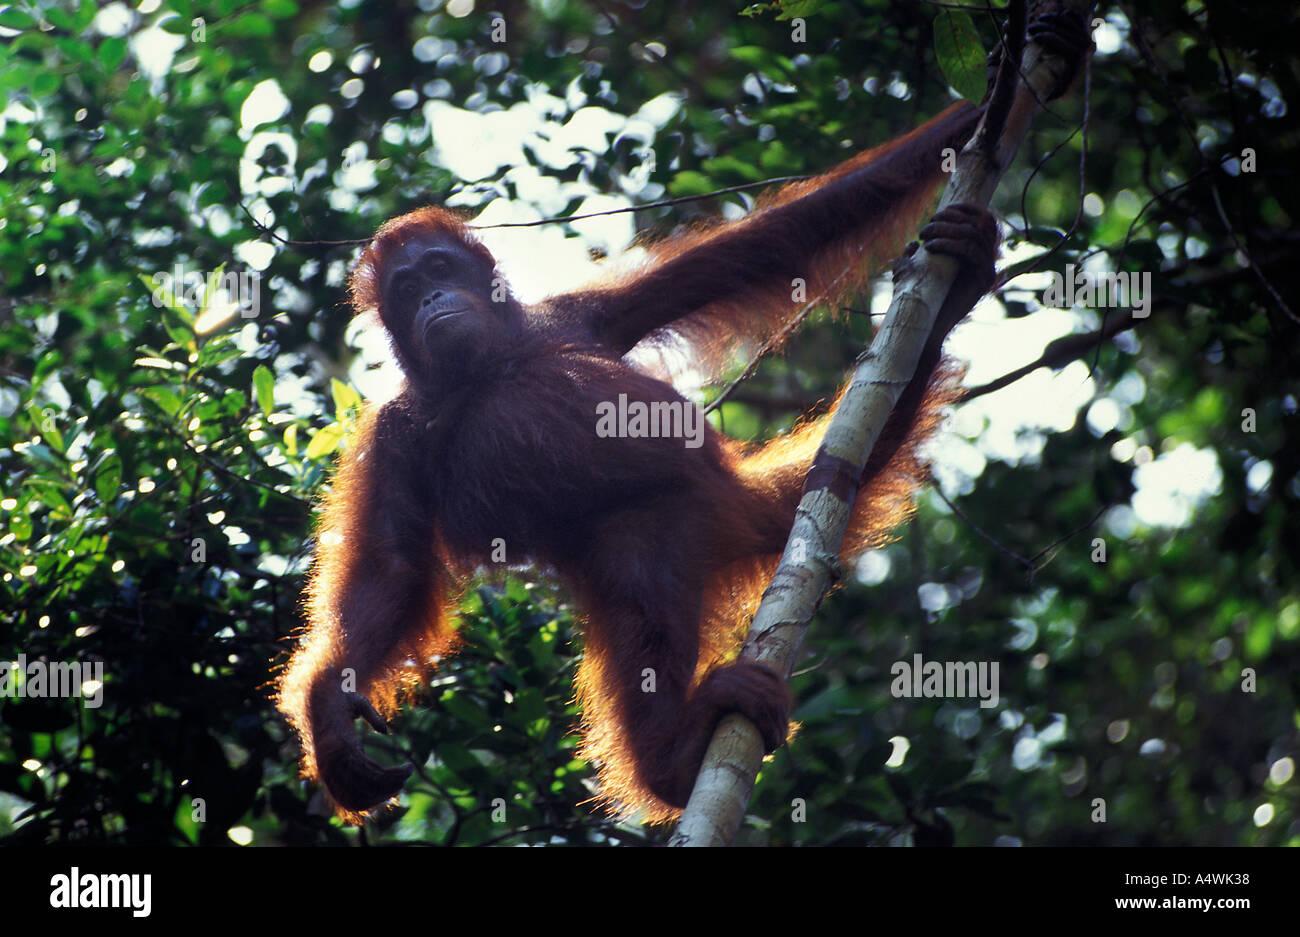 Wild orangutan, Pongo pygmaeus, in Gunung Palung National Park Kalimantan Indonesia - Stock Image